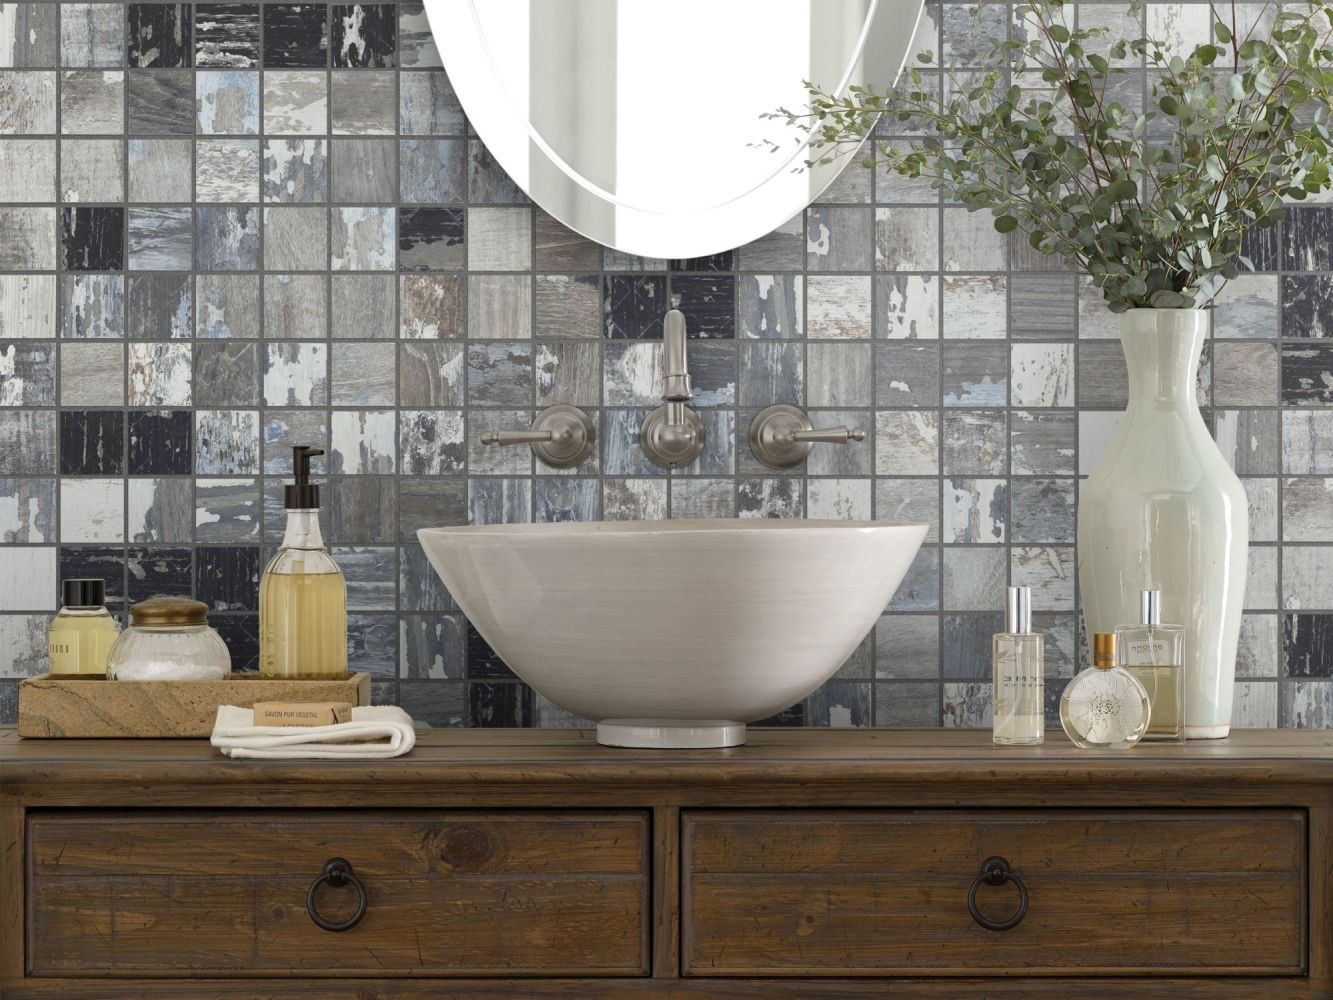 Shaw Floors Home Fn Gold Ceramic Sleepy Hollow Mosaic Hickory 00540_TG48C